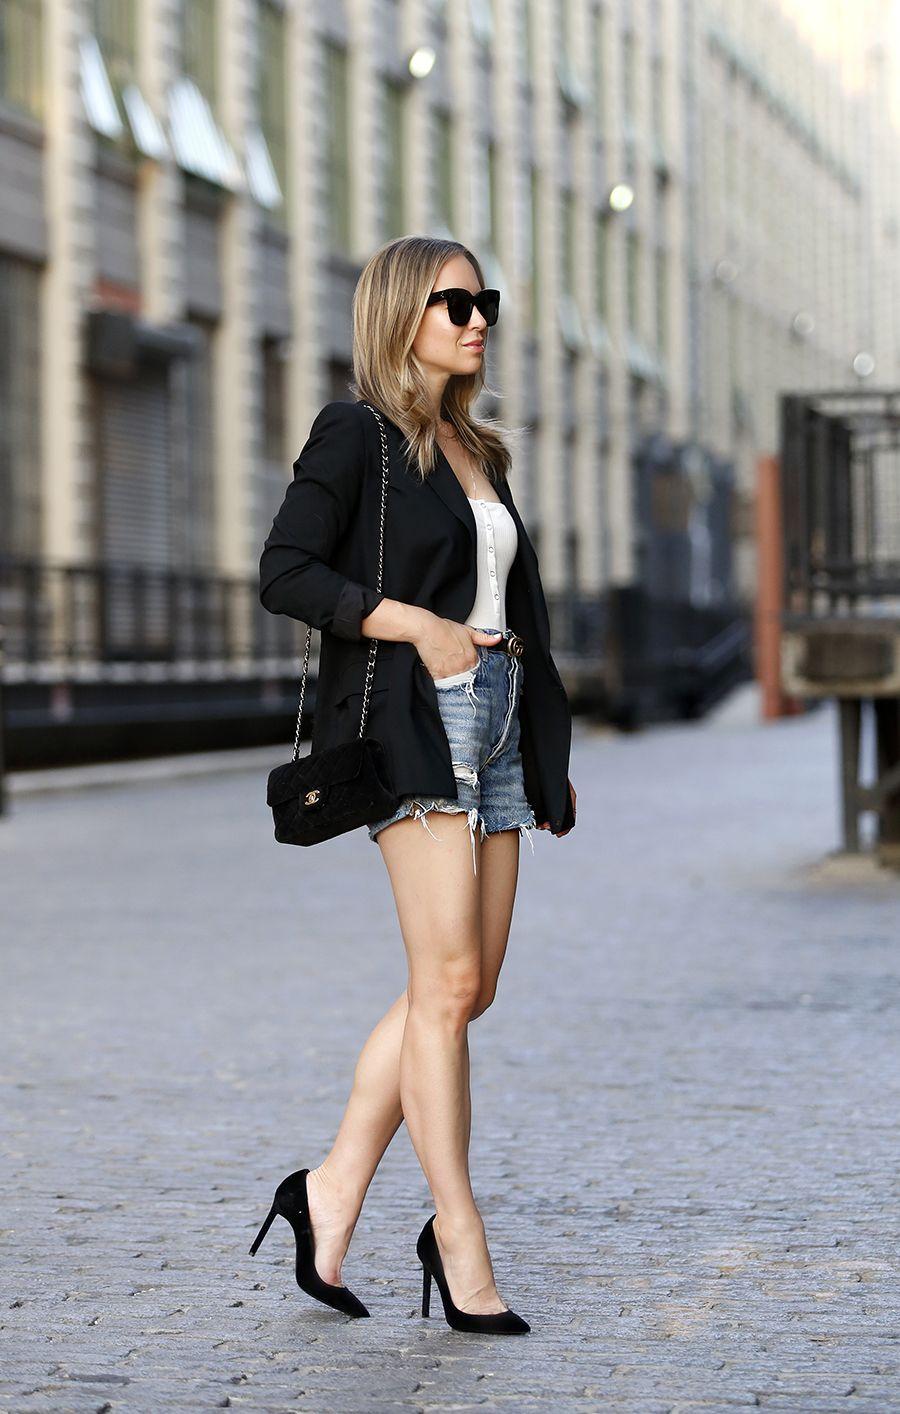 Hazelnut | Brooklyn blonde, Dressy casual outfits, Fall